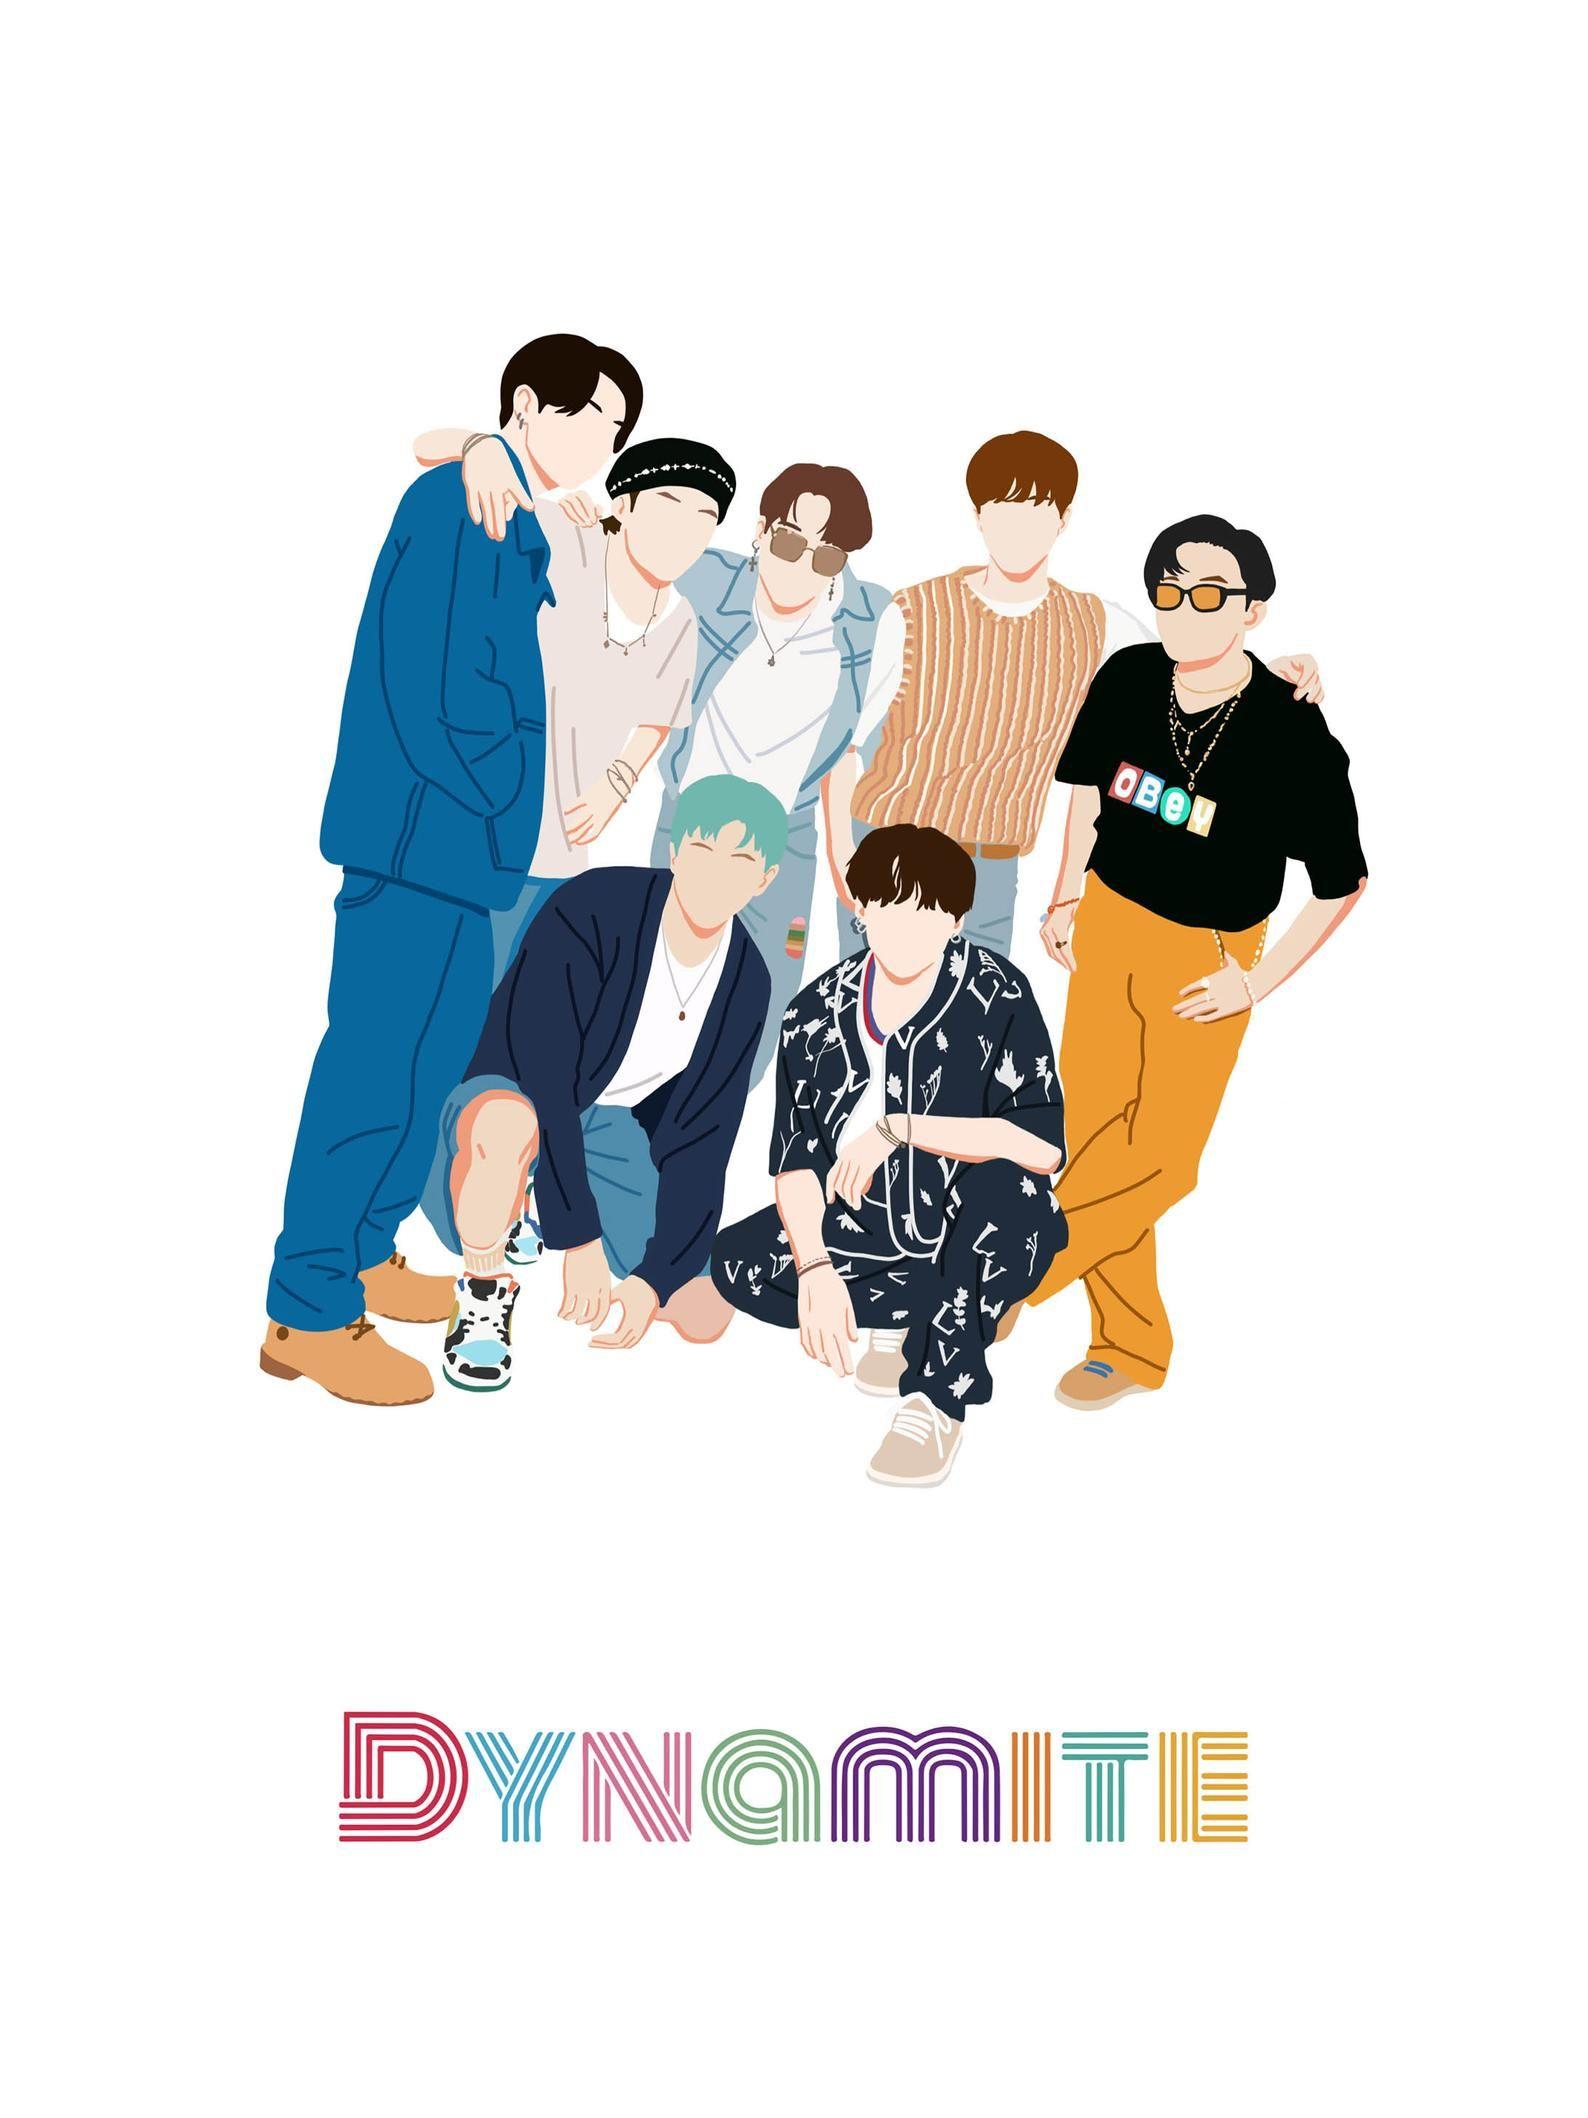 Bts Dynamite Poster Bts Dynamite Printable Bts Sticker Kpop Etsy In 2021 Bts Drawings Cute Stickers Bts Polaroid Bts wallpaper 2021 dynamite